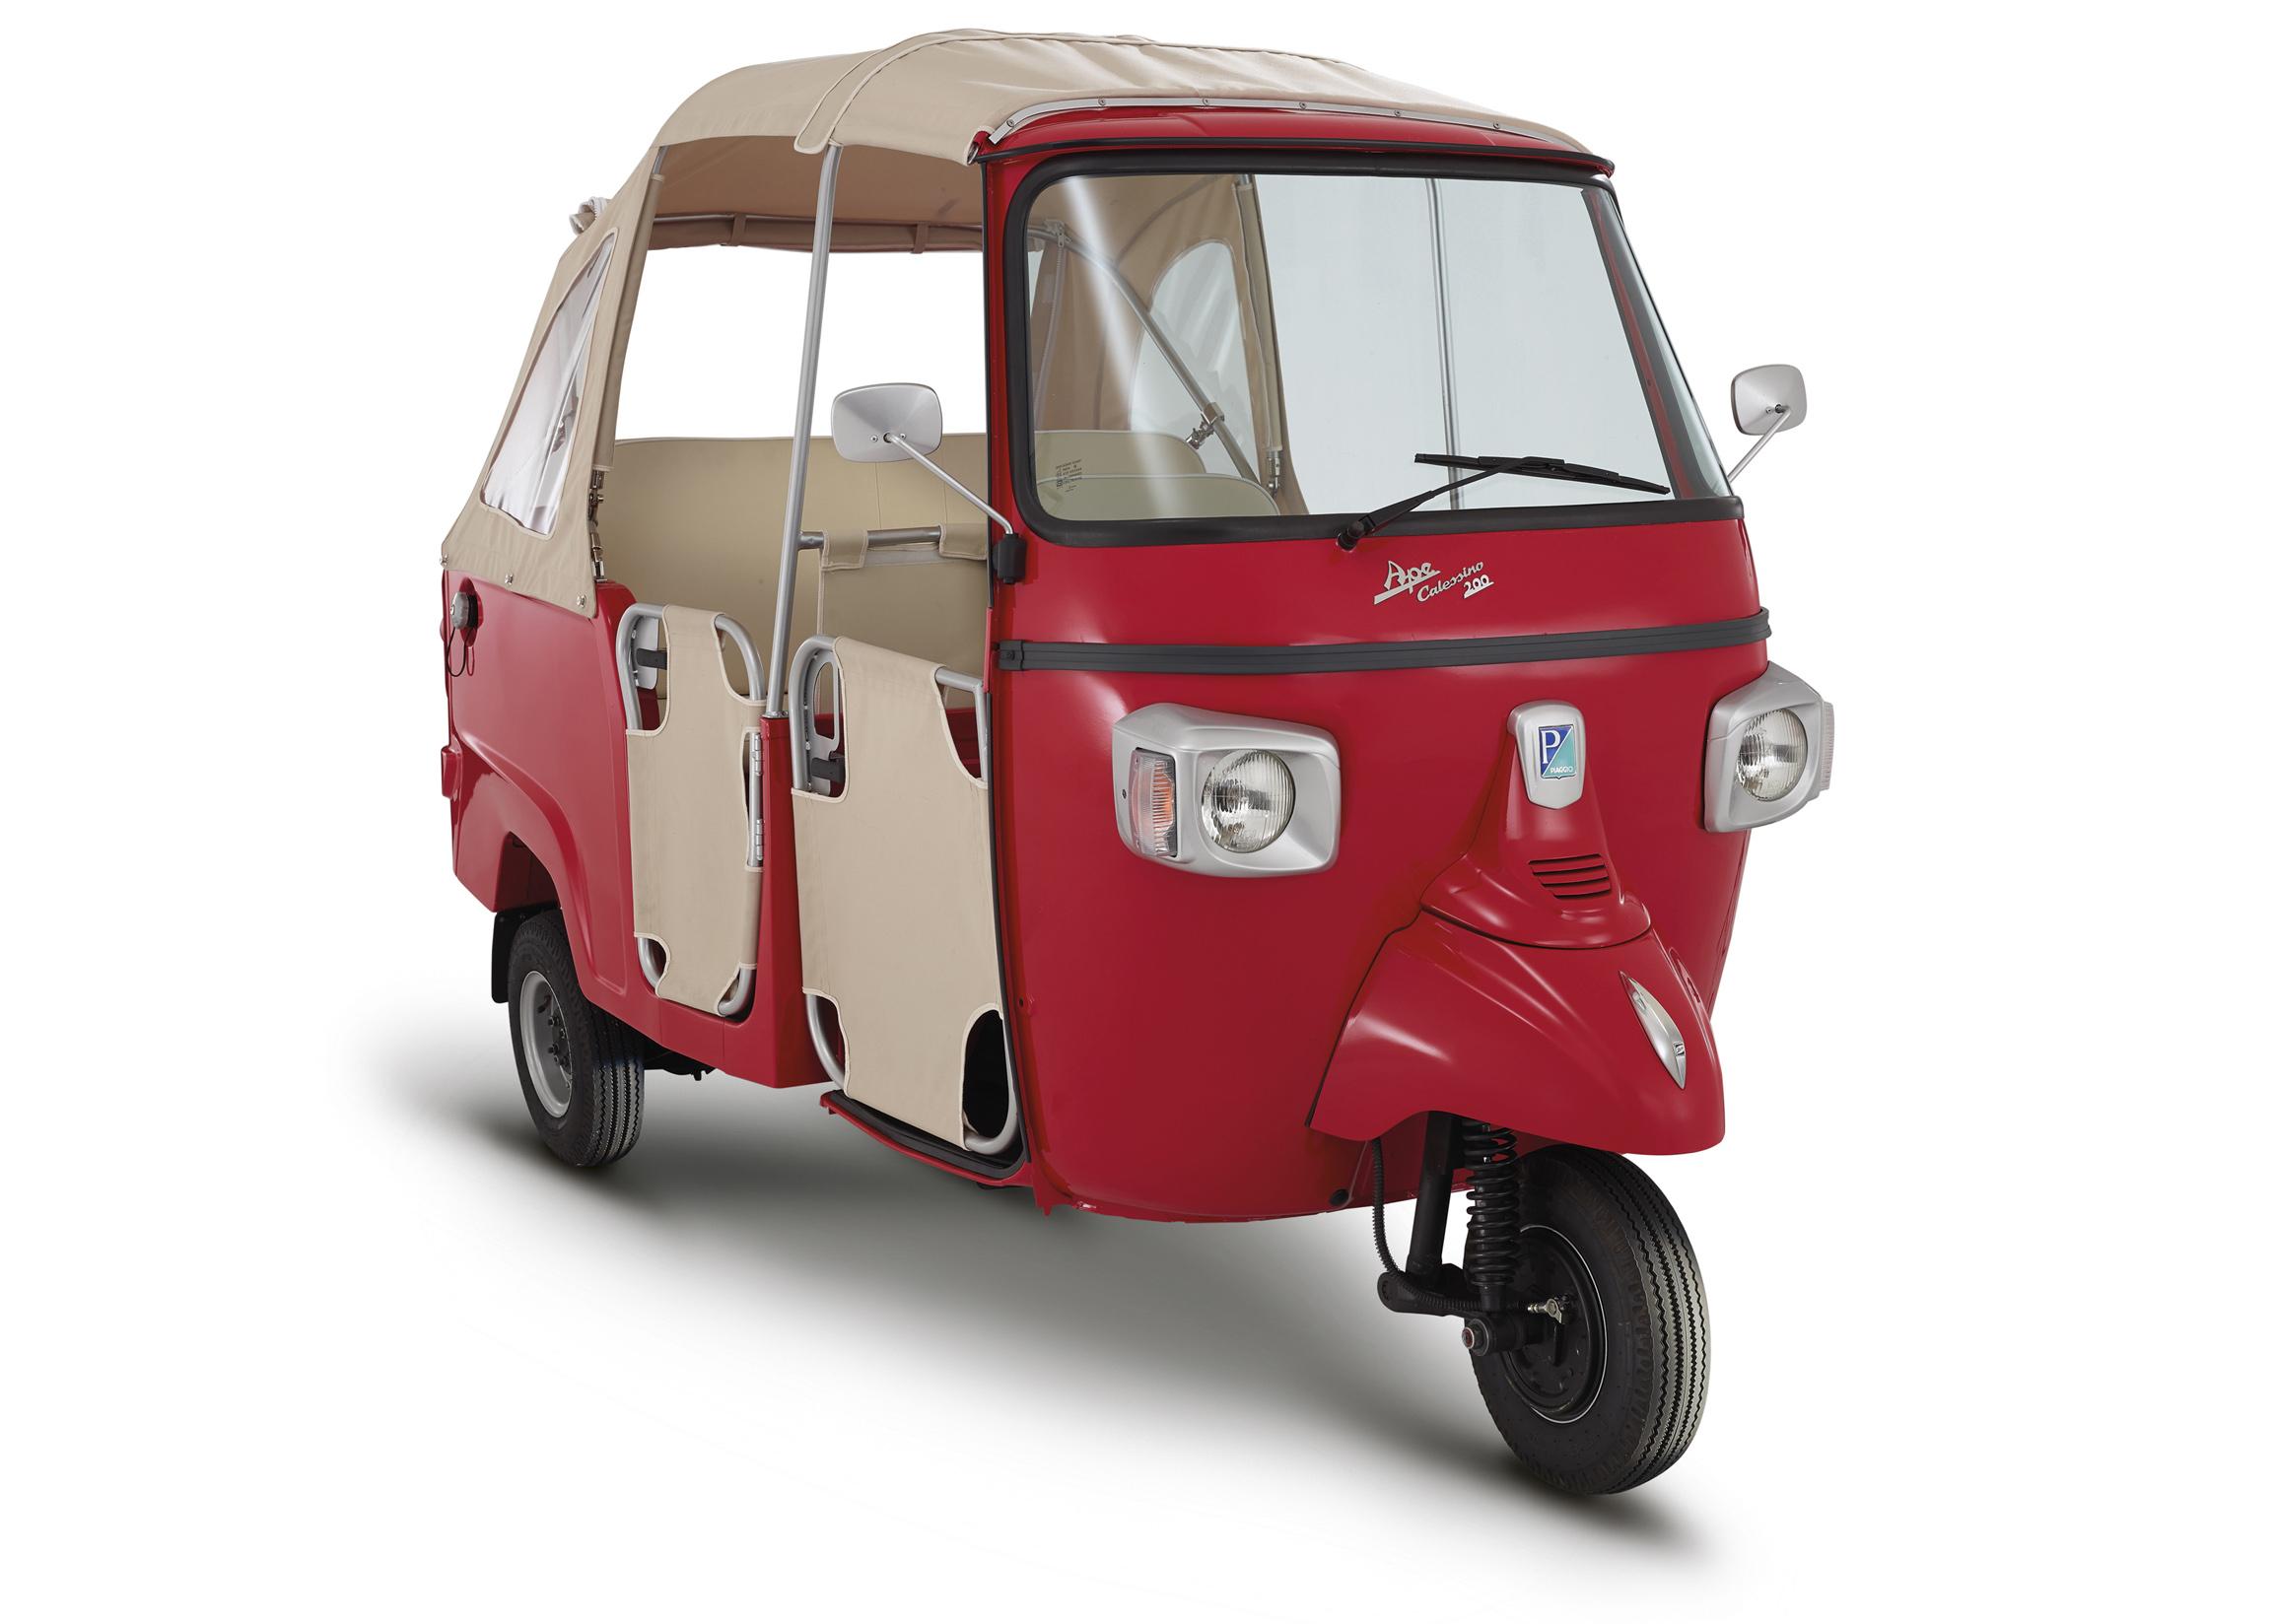 ape calessino piaggio commercial vehicles. Black Bedroom Furniture Sets. Home Design Ideas